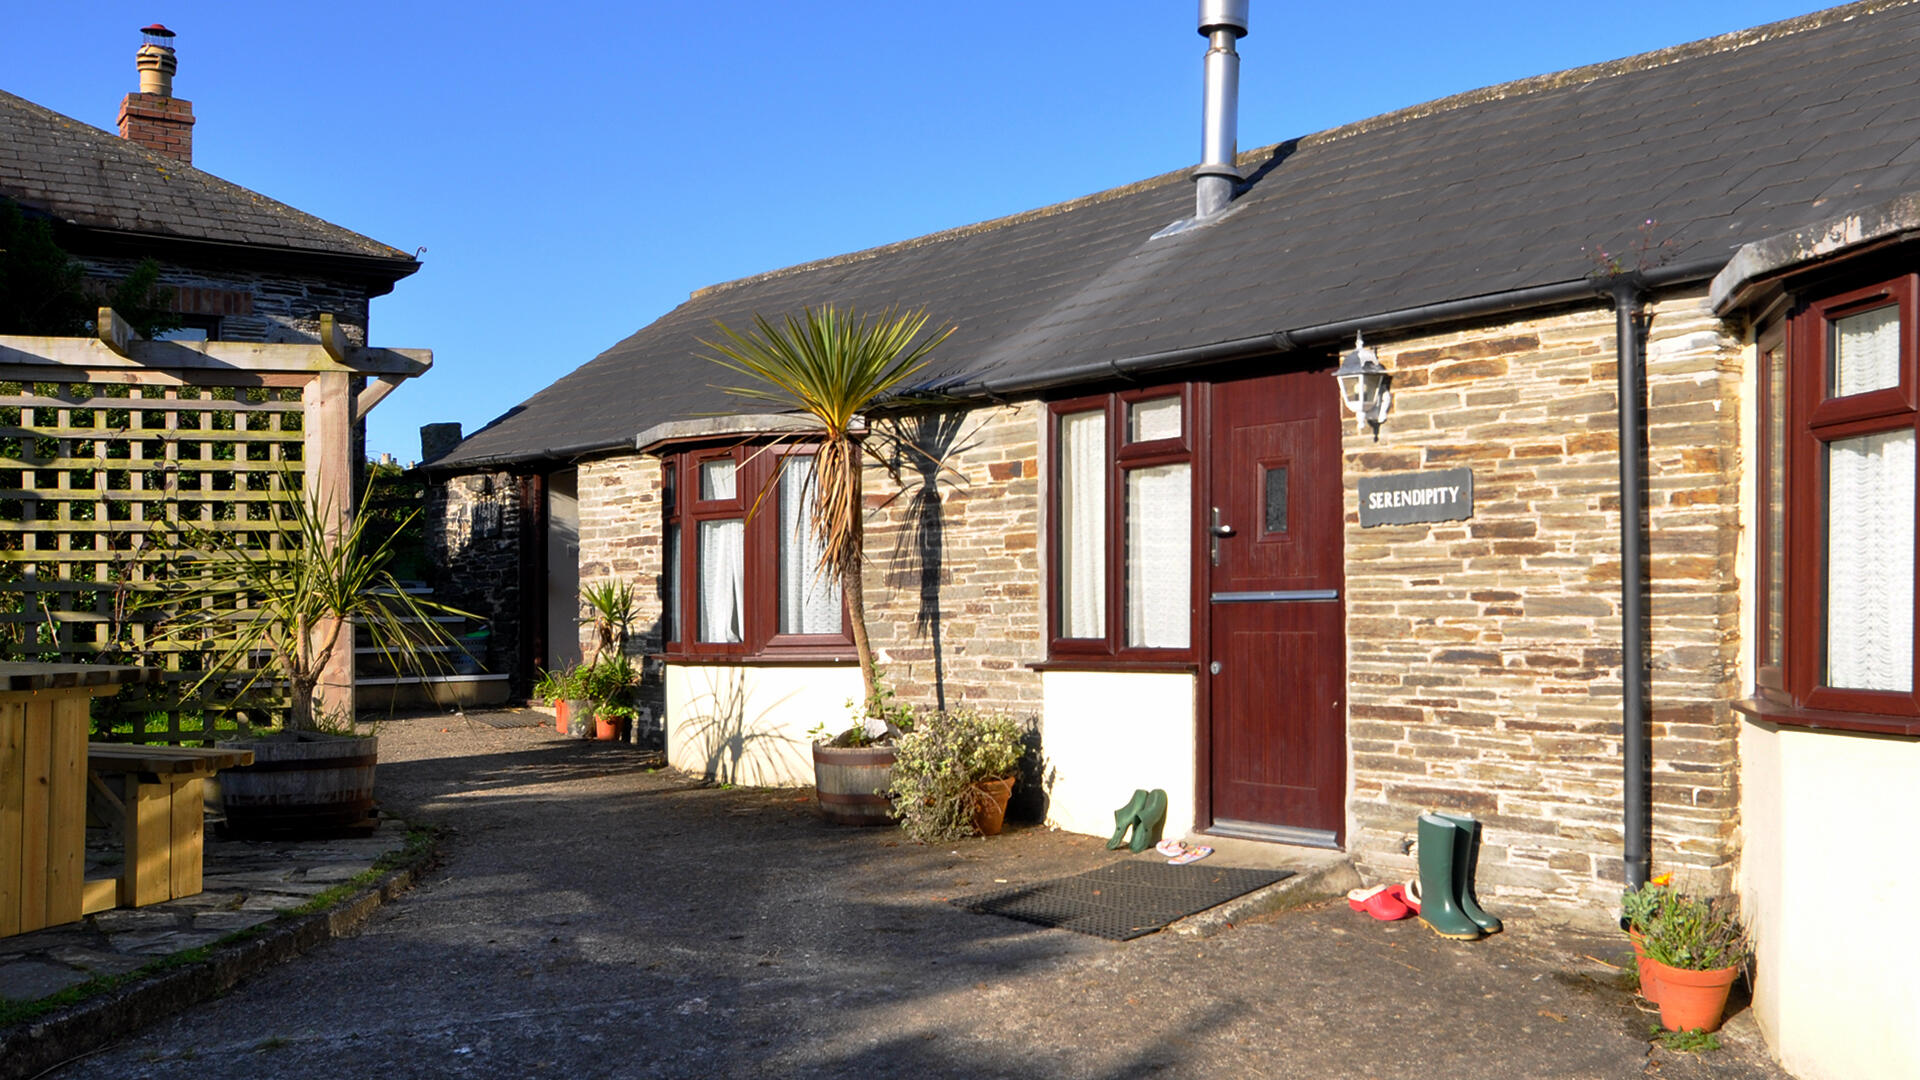 Trevorrick Farm, Cornwall